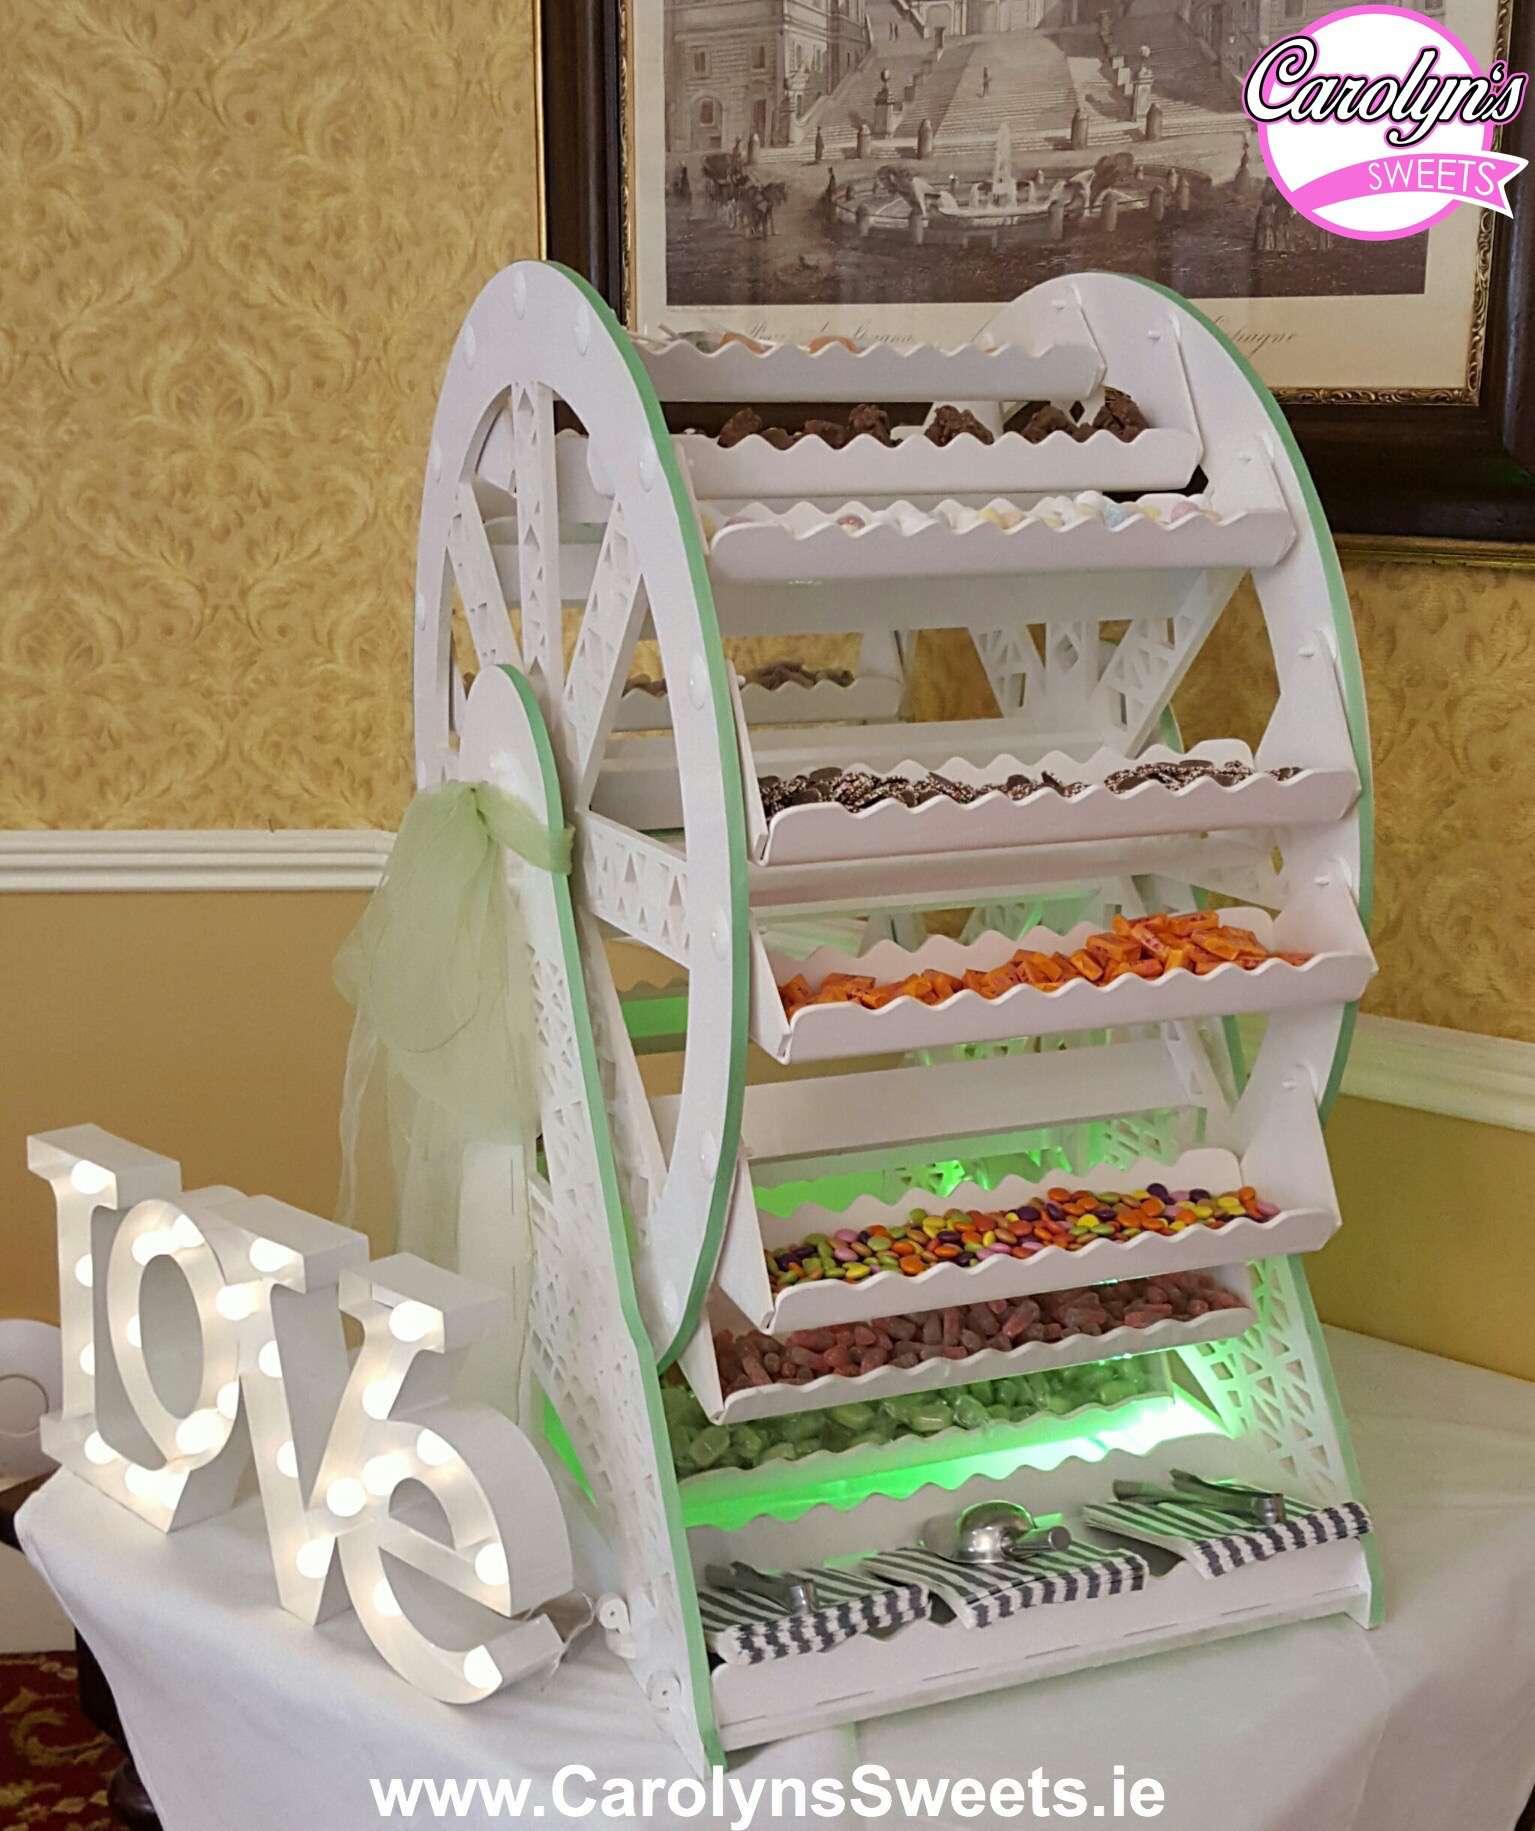 Candy Ferris Wheel Hire1 2